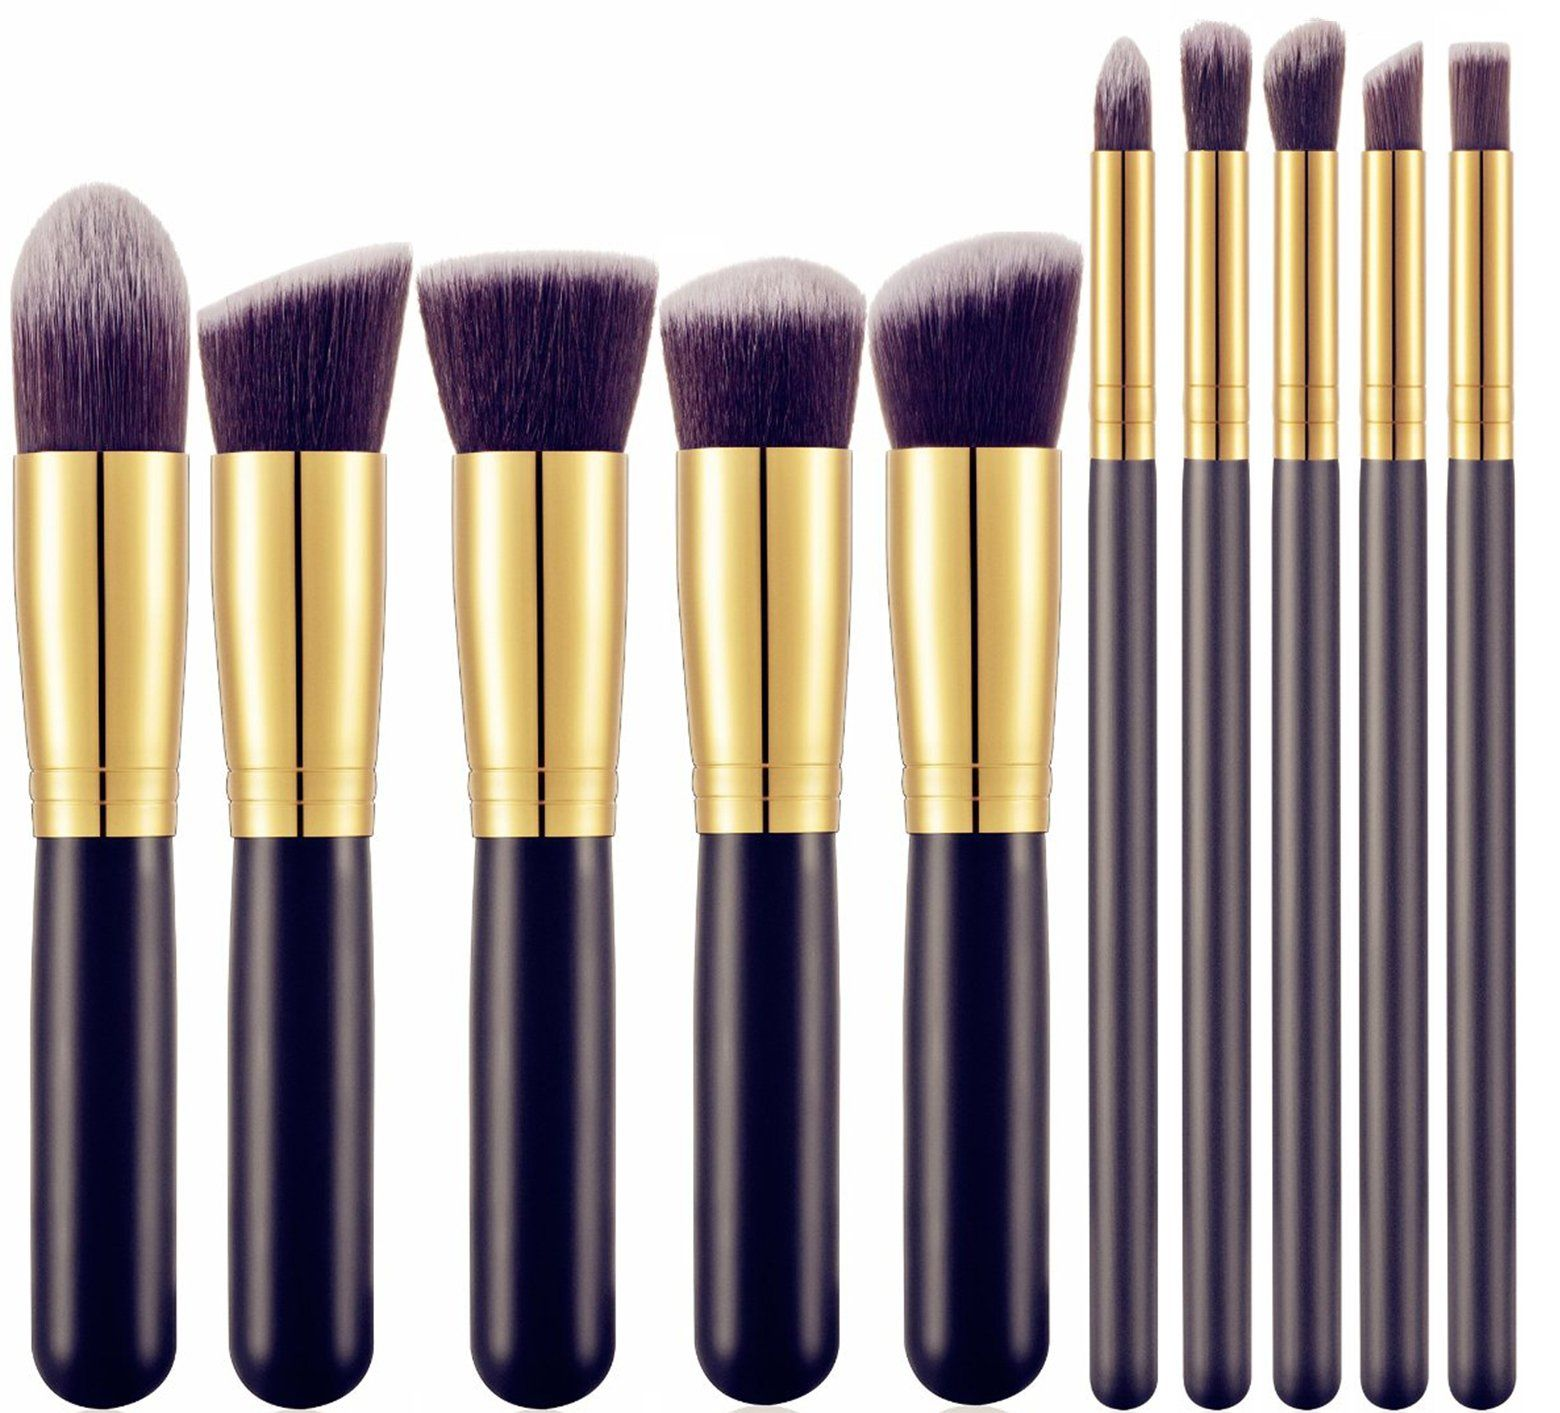 BSMALL(TM) Premium Synthetic Kabuki Makeup Brush Set